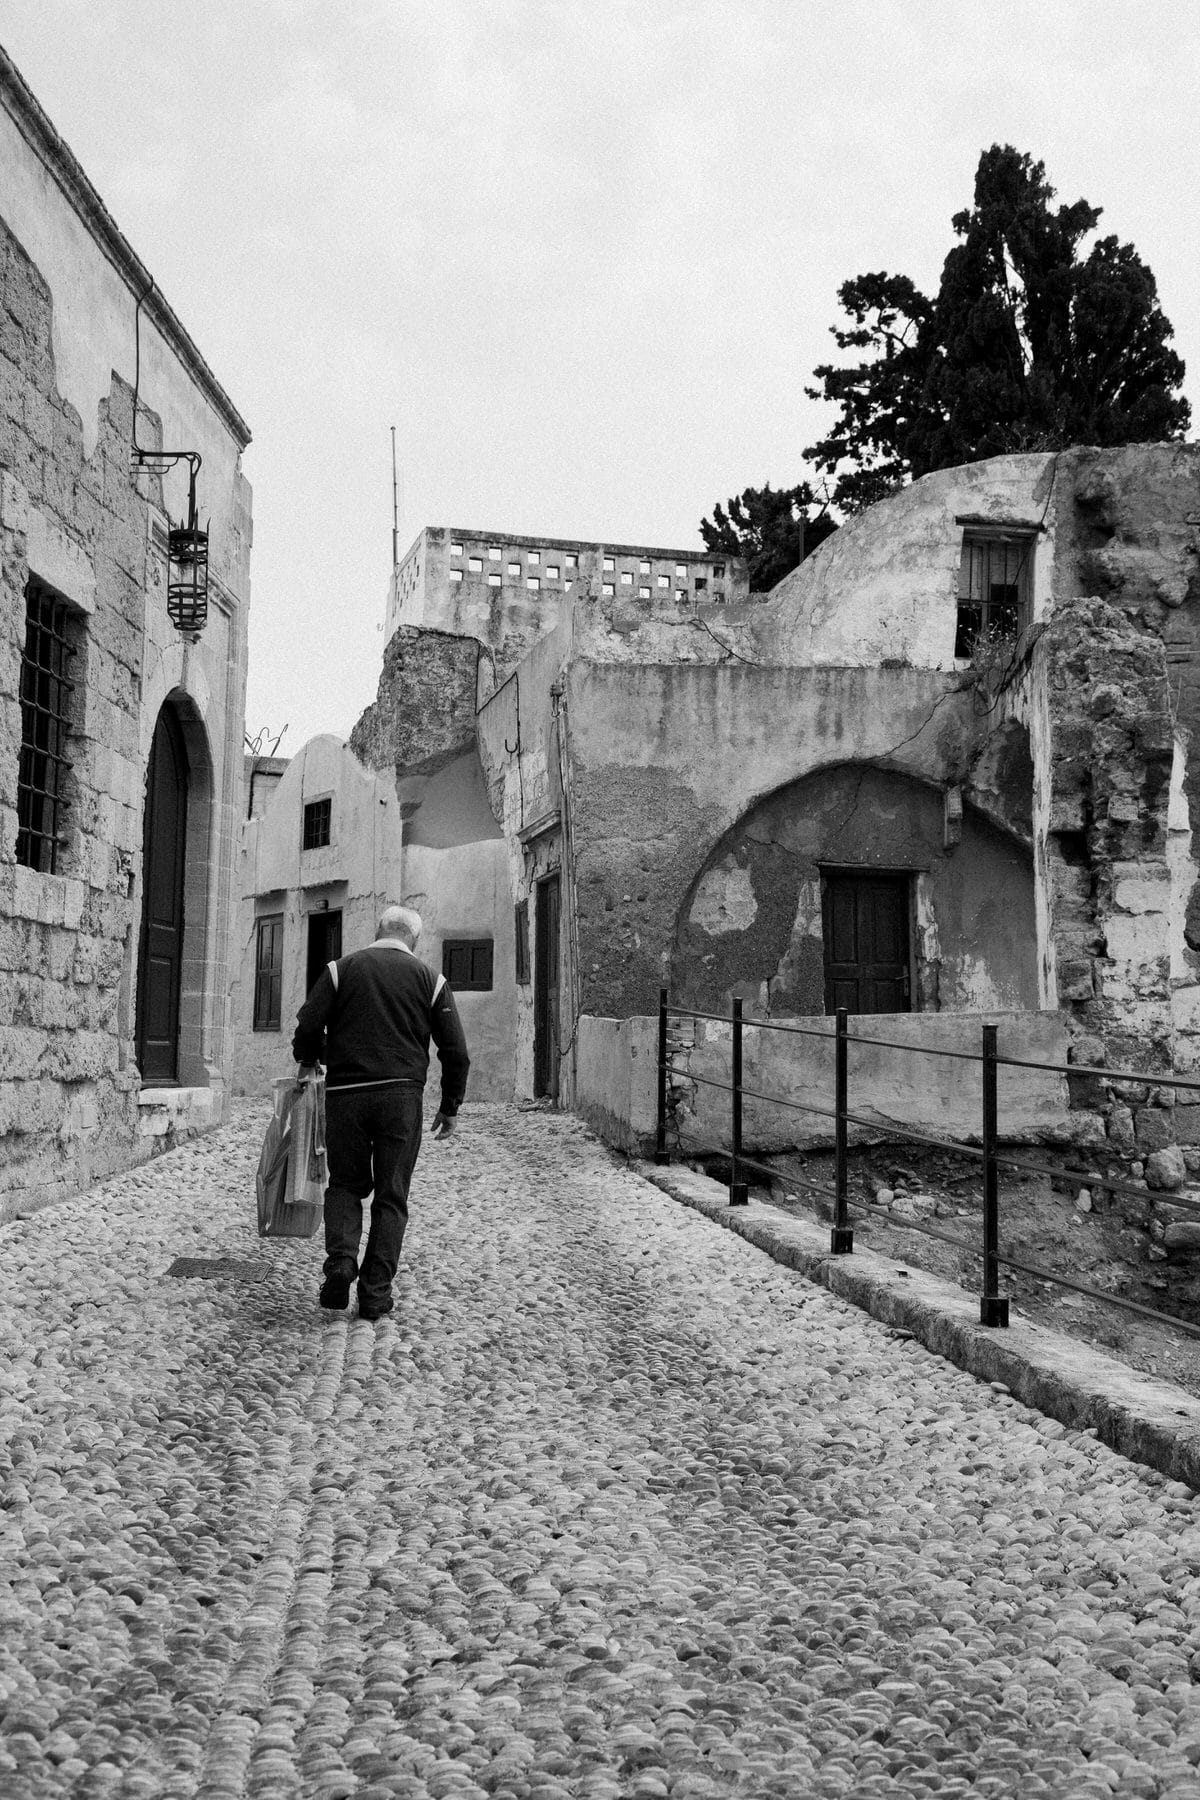 Rhodes-Greece-Island-black-and-white-fine-art-photography-by-Studio-L-photographer-Laura-Schneider-_2583